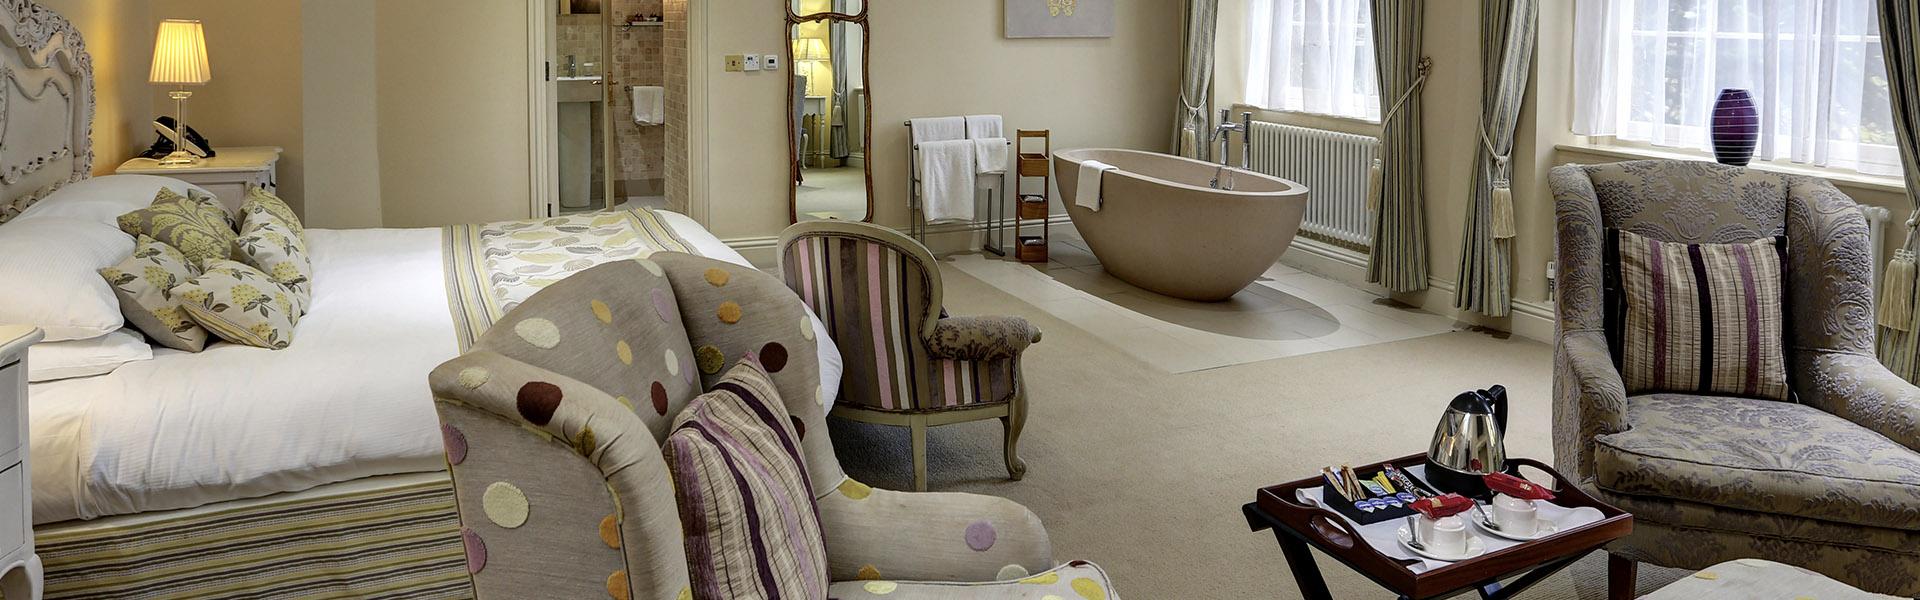 Luxury bedrooms at Mosborough Hall Hotel Vine Hotel Management